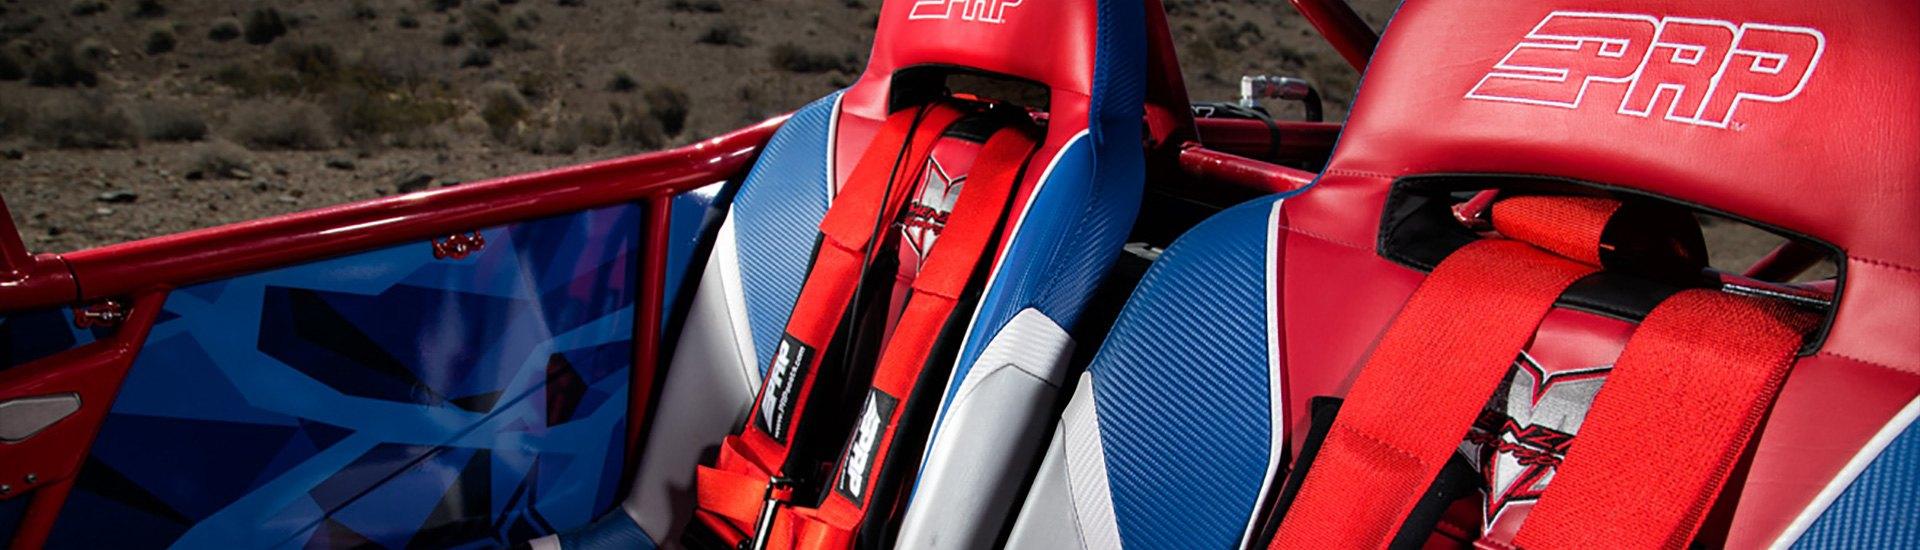 K/&L Seat Cushion Rubber Set #25-6384 Honda